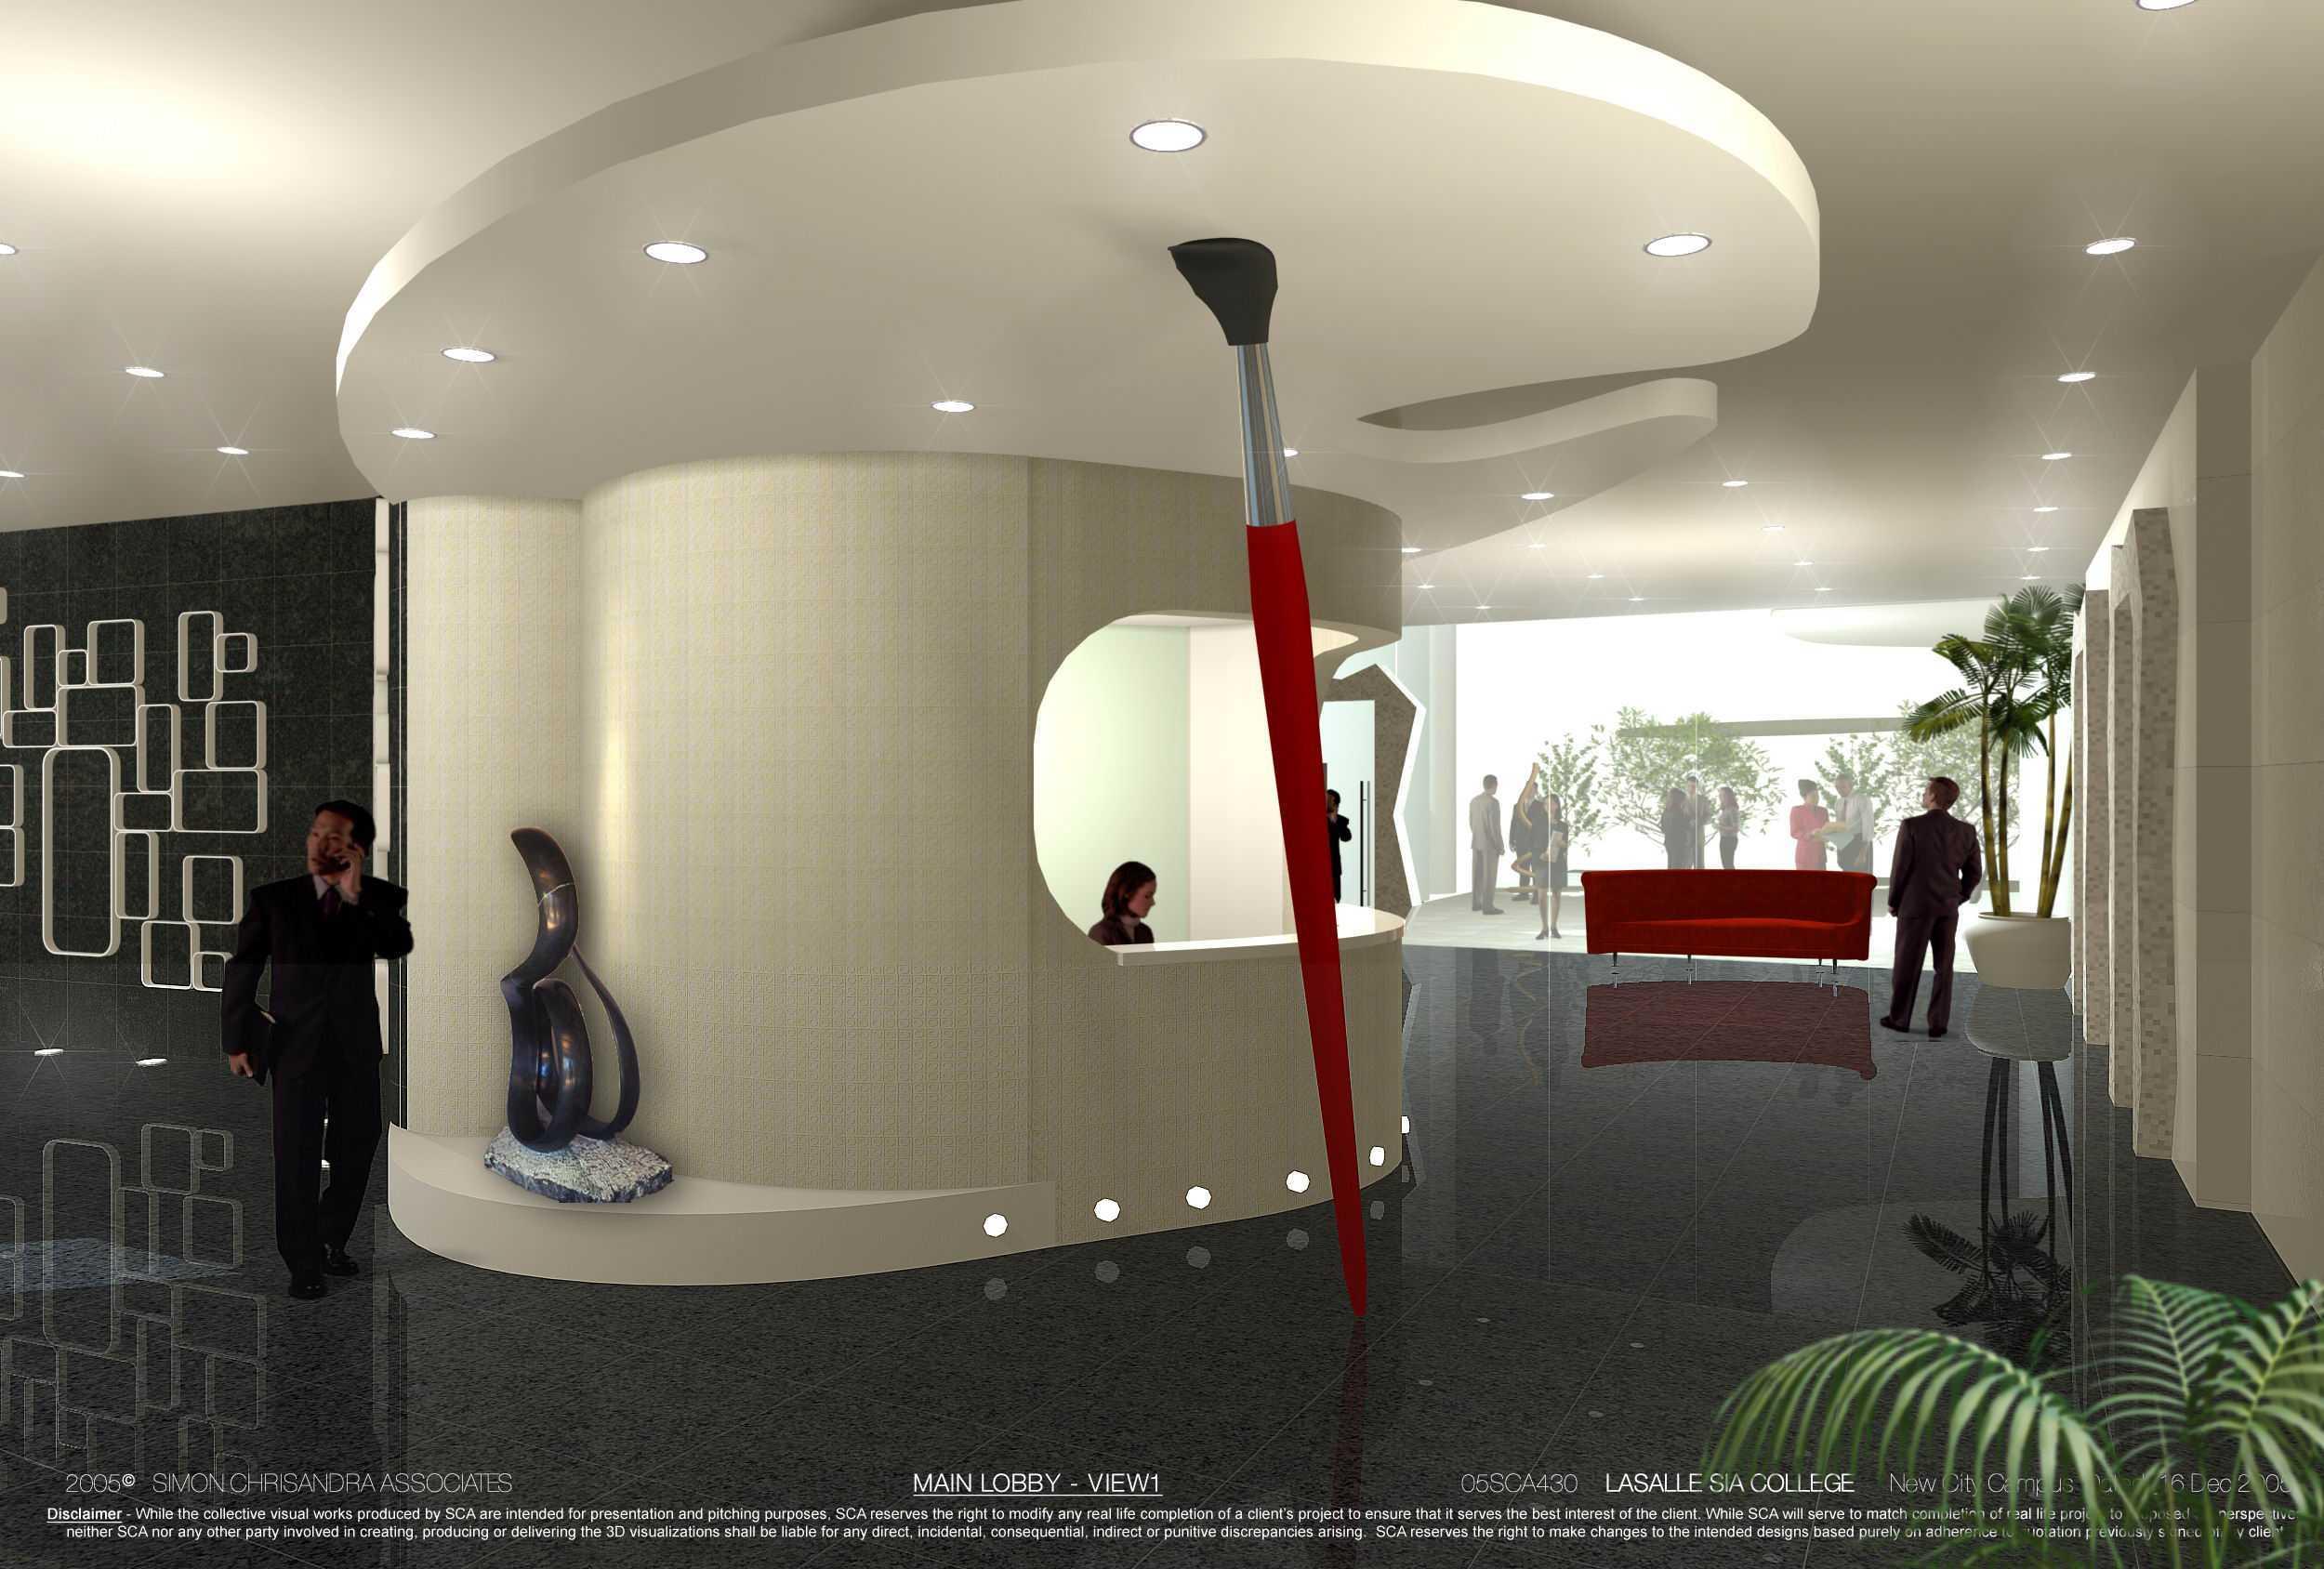 Rully Tanuwidjaja The New City Campus Lasalle-Sia Singapura Singapura Administration Counter Lobby Kontemporer  48069